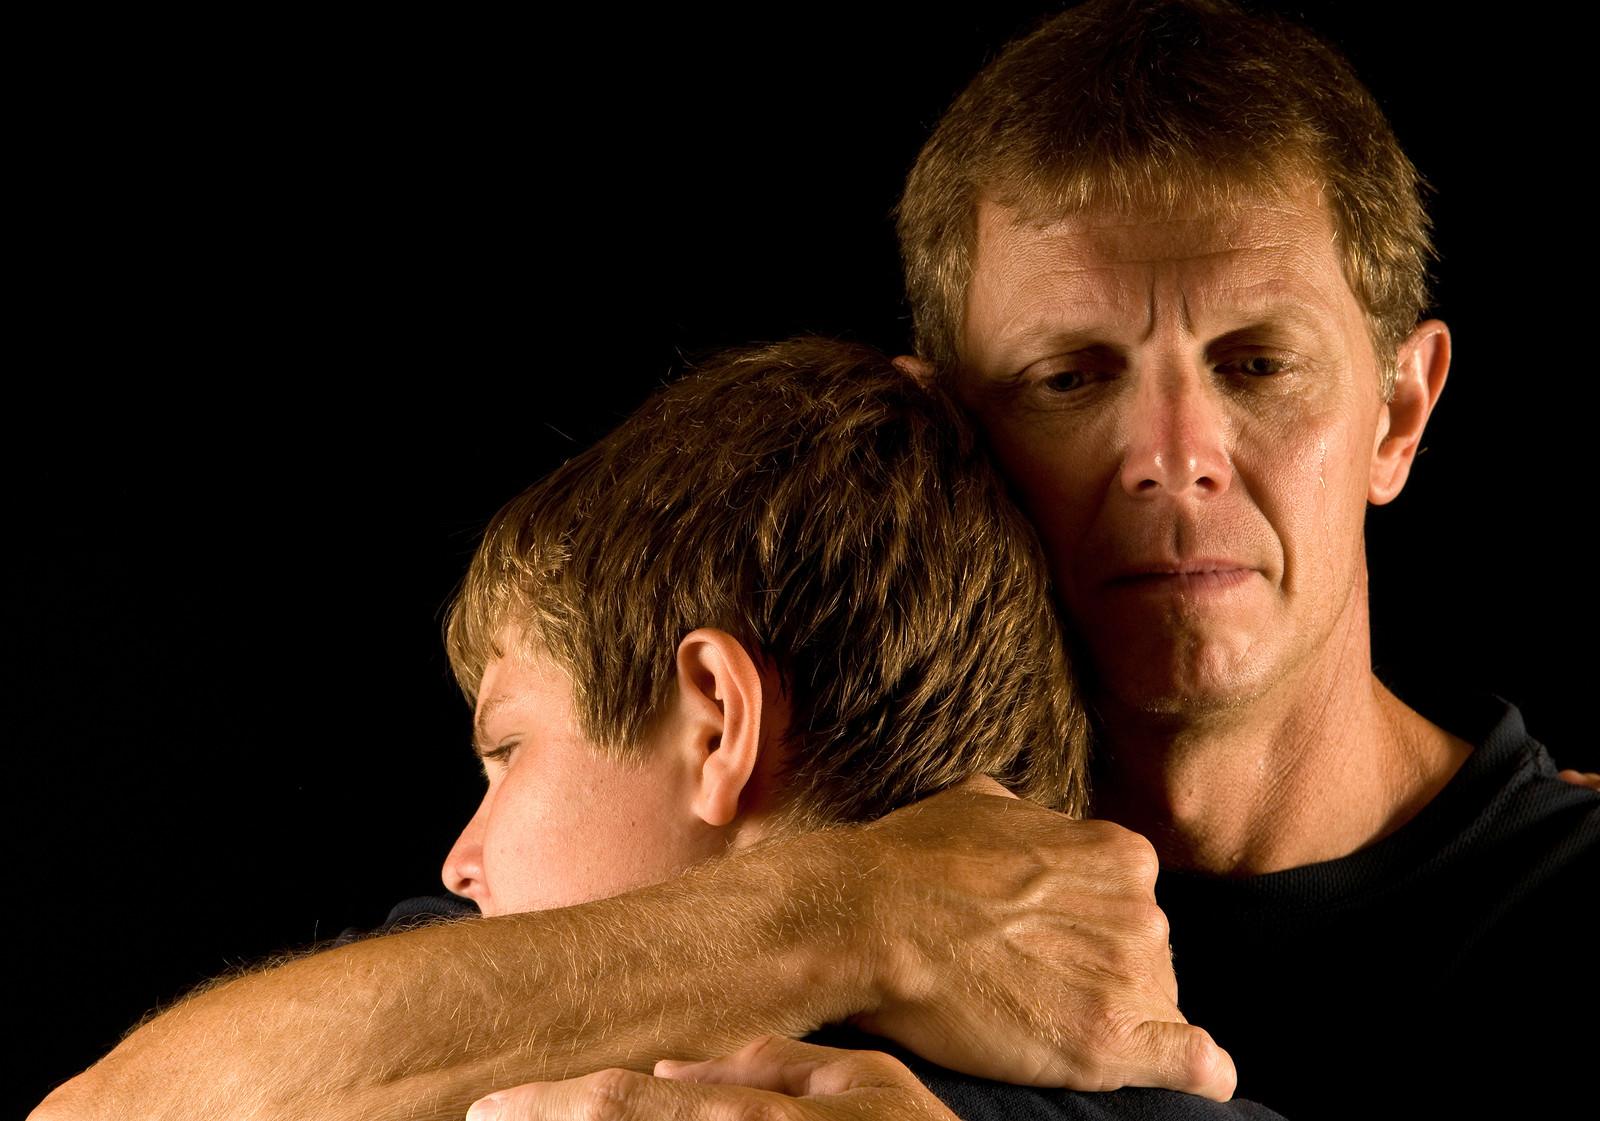 Отец обнимает сына картинки